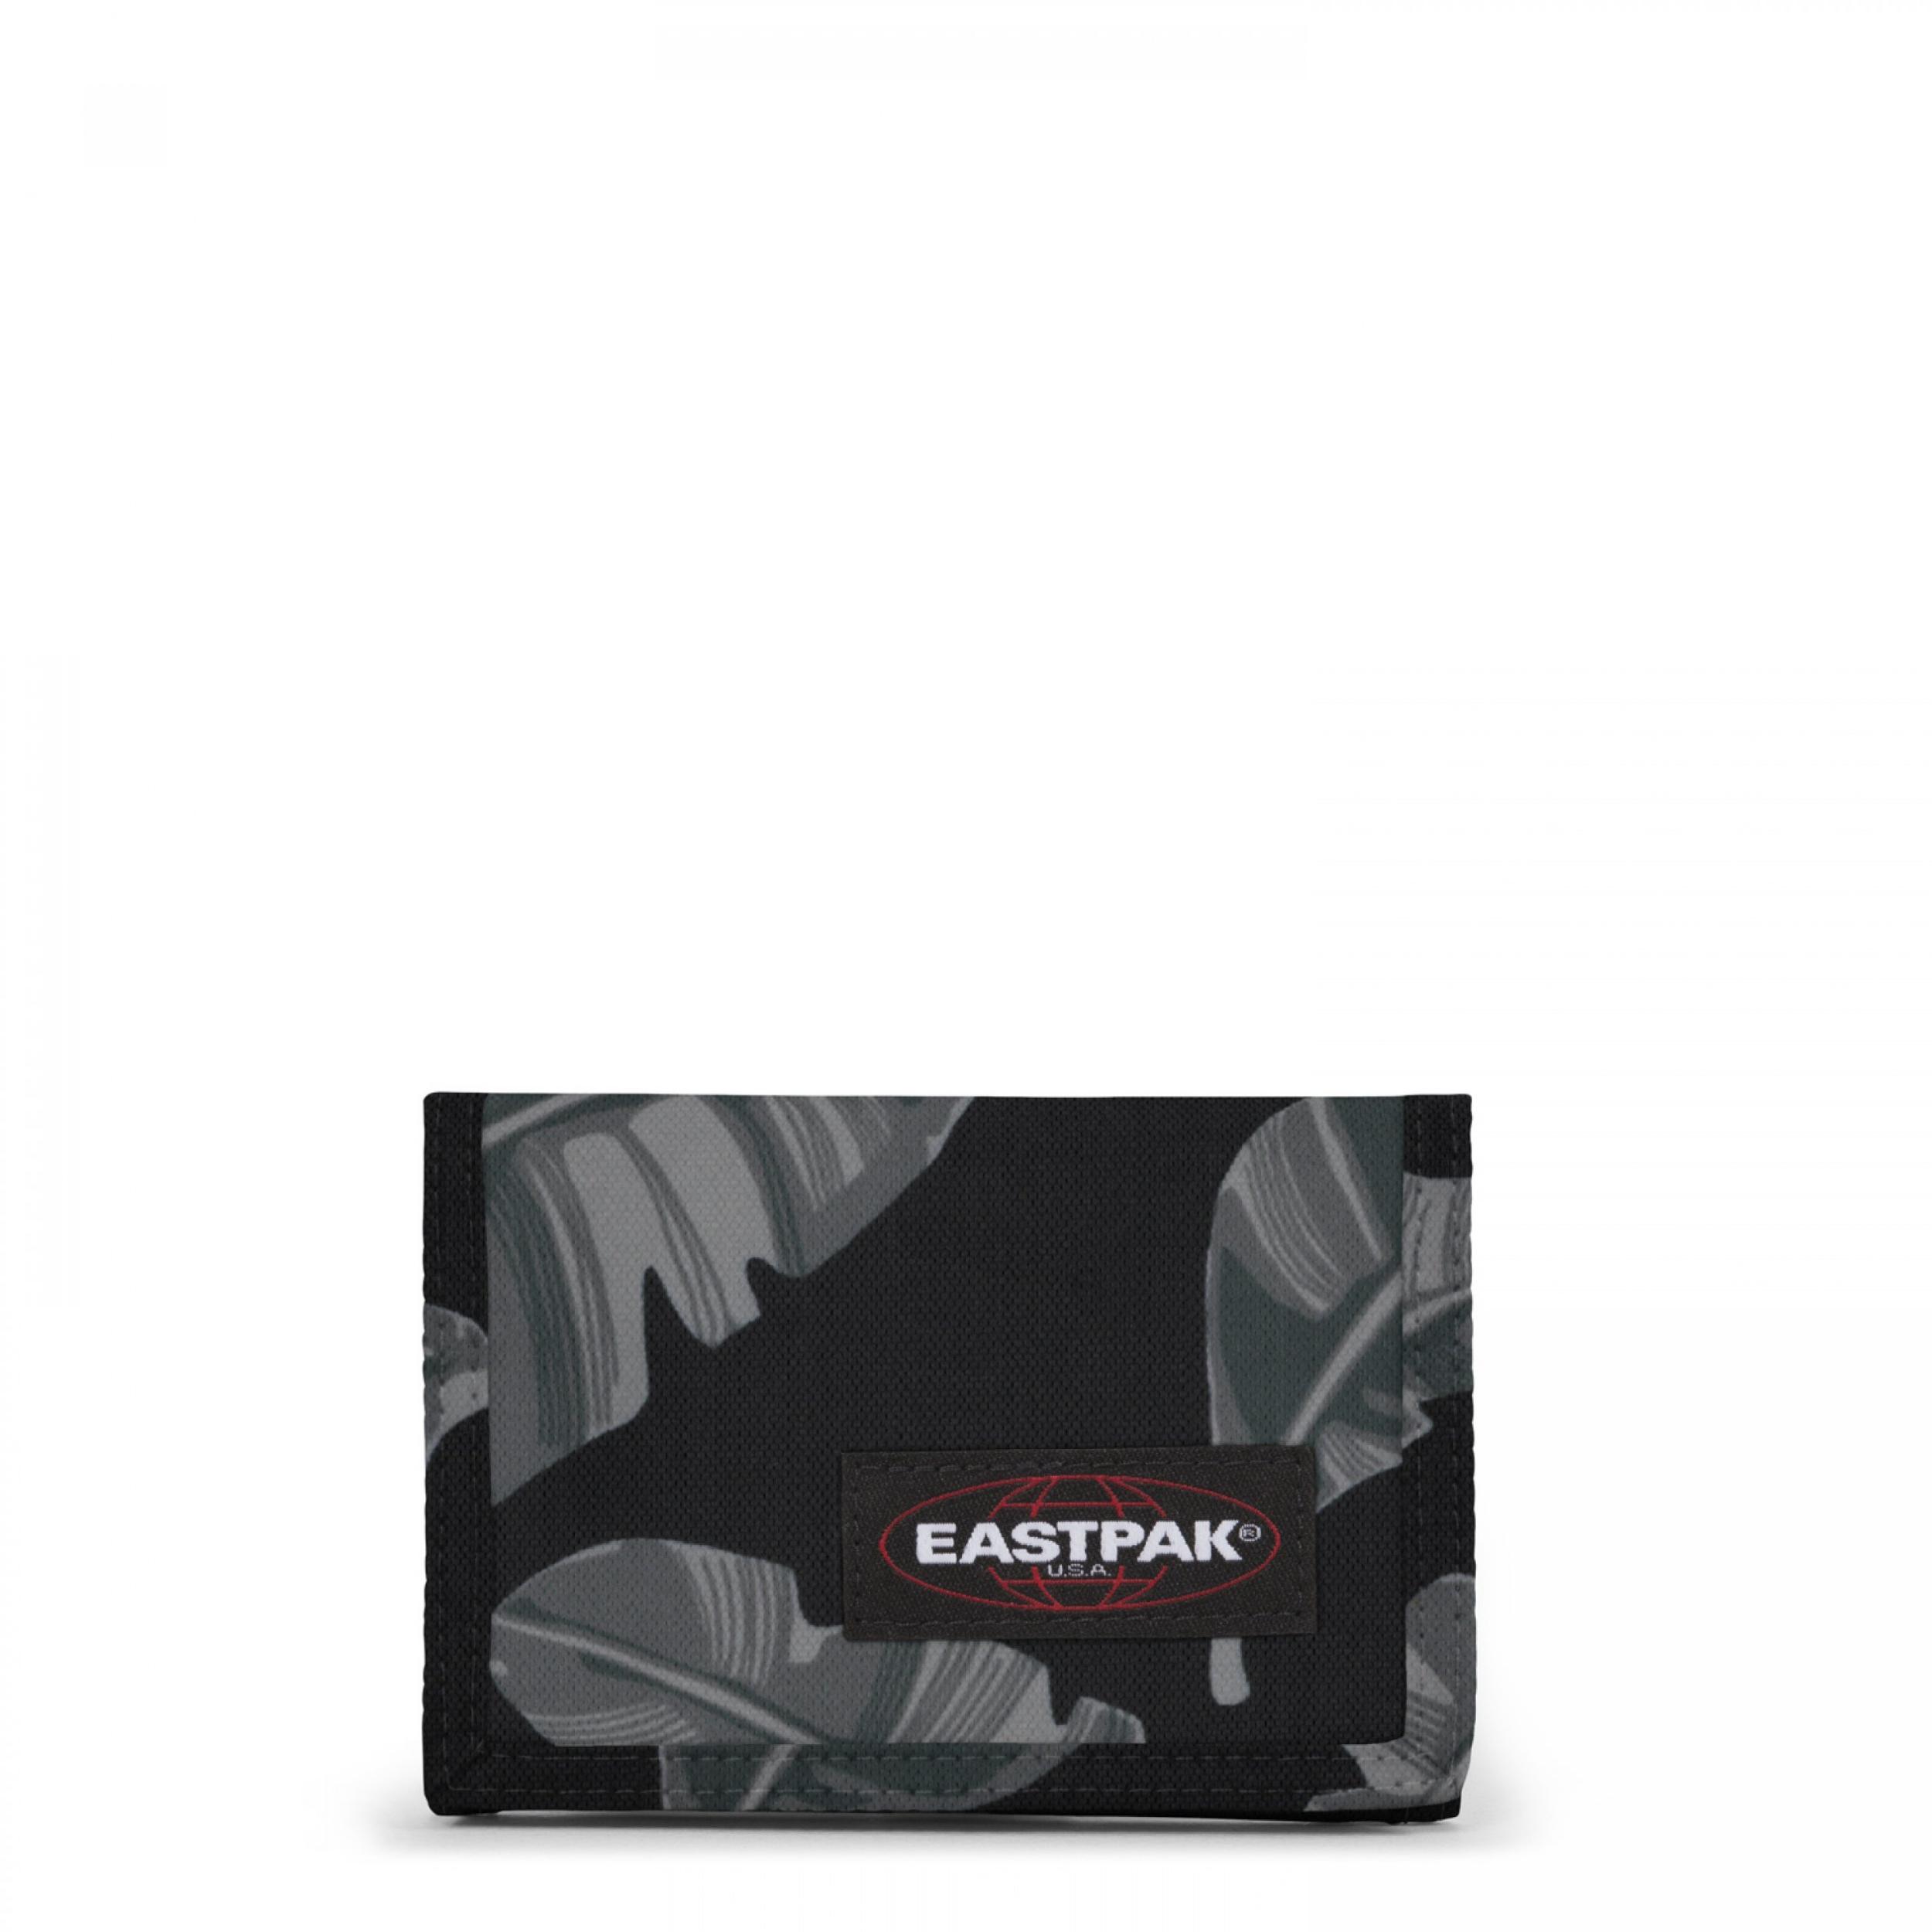 Eastpak CREW SINGLE Portemonnee Brize Leaves Black